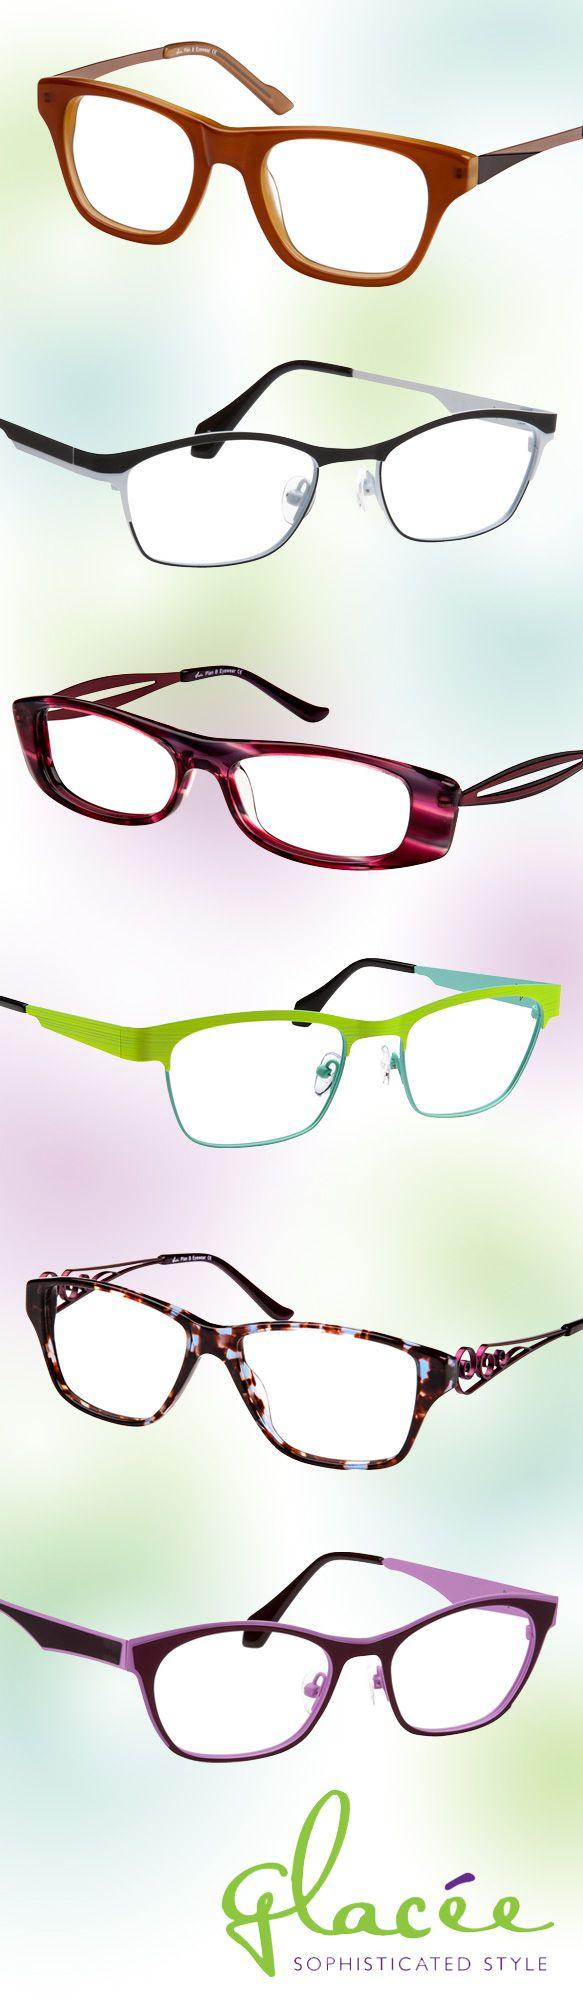 127 best Gafas graduadas images on Pinterest | Anteojos, Gafas de ...